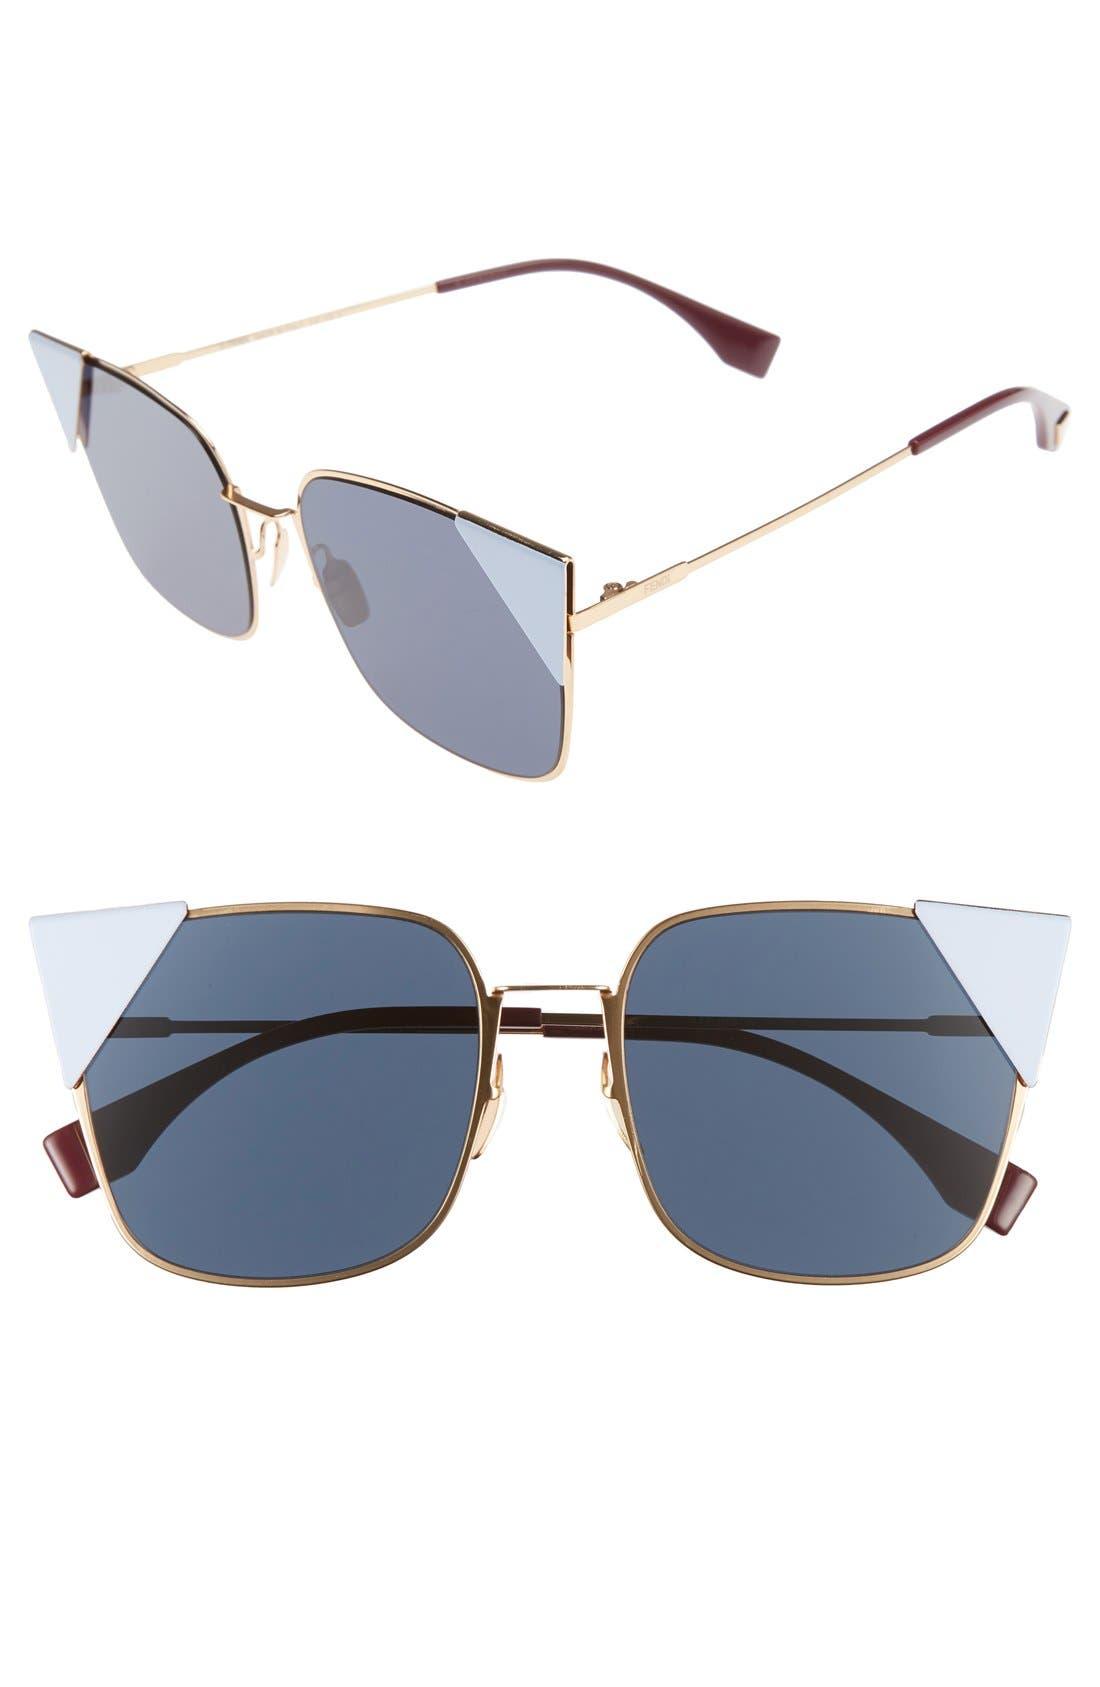 59138d6f91 Fendi Sunglasses for Women